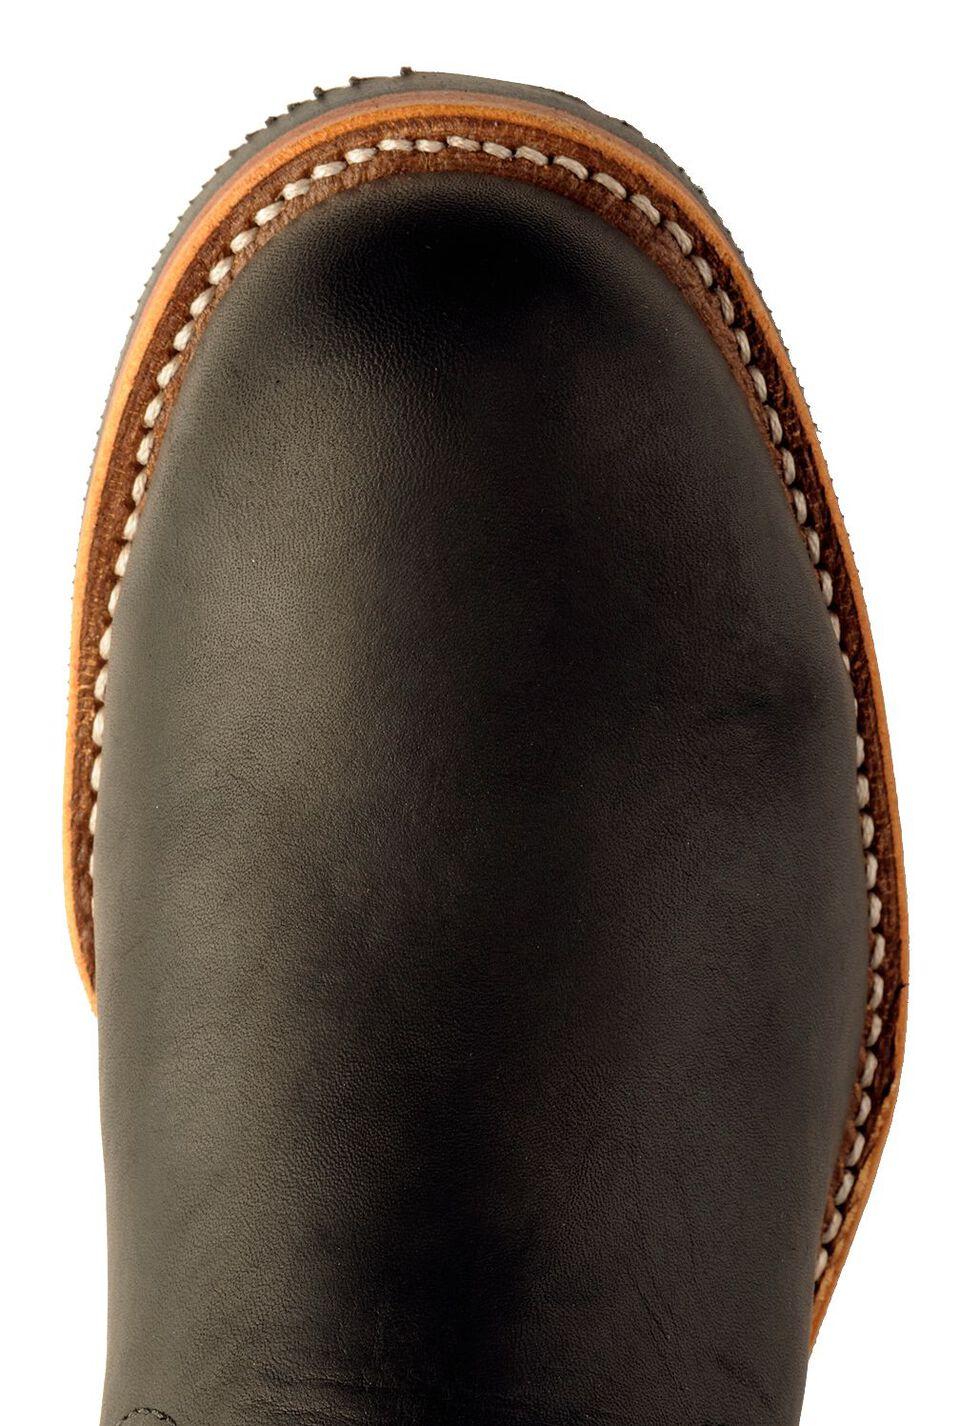 Chippewa Engineer Boots - Steel Toe, Black, hi-res